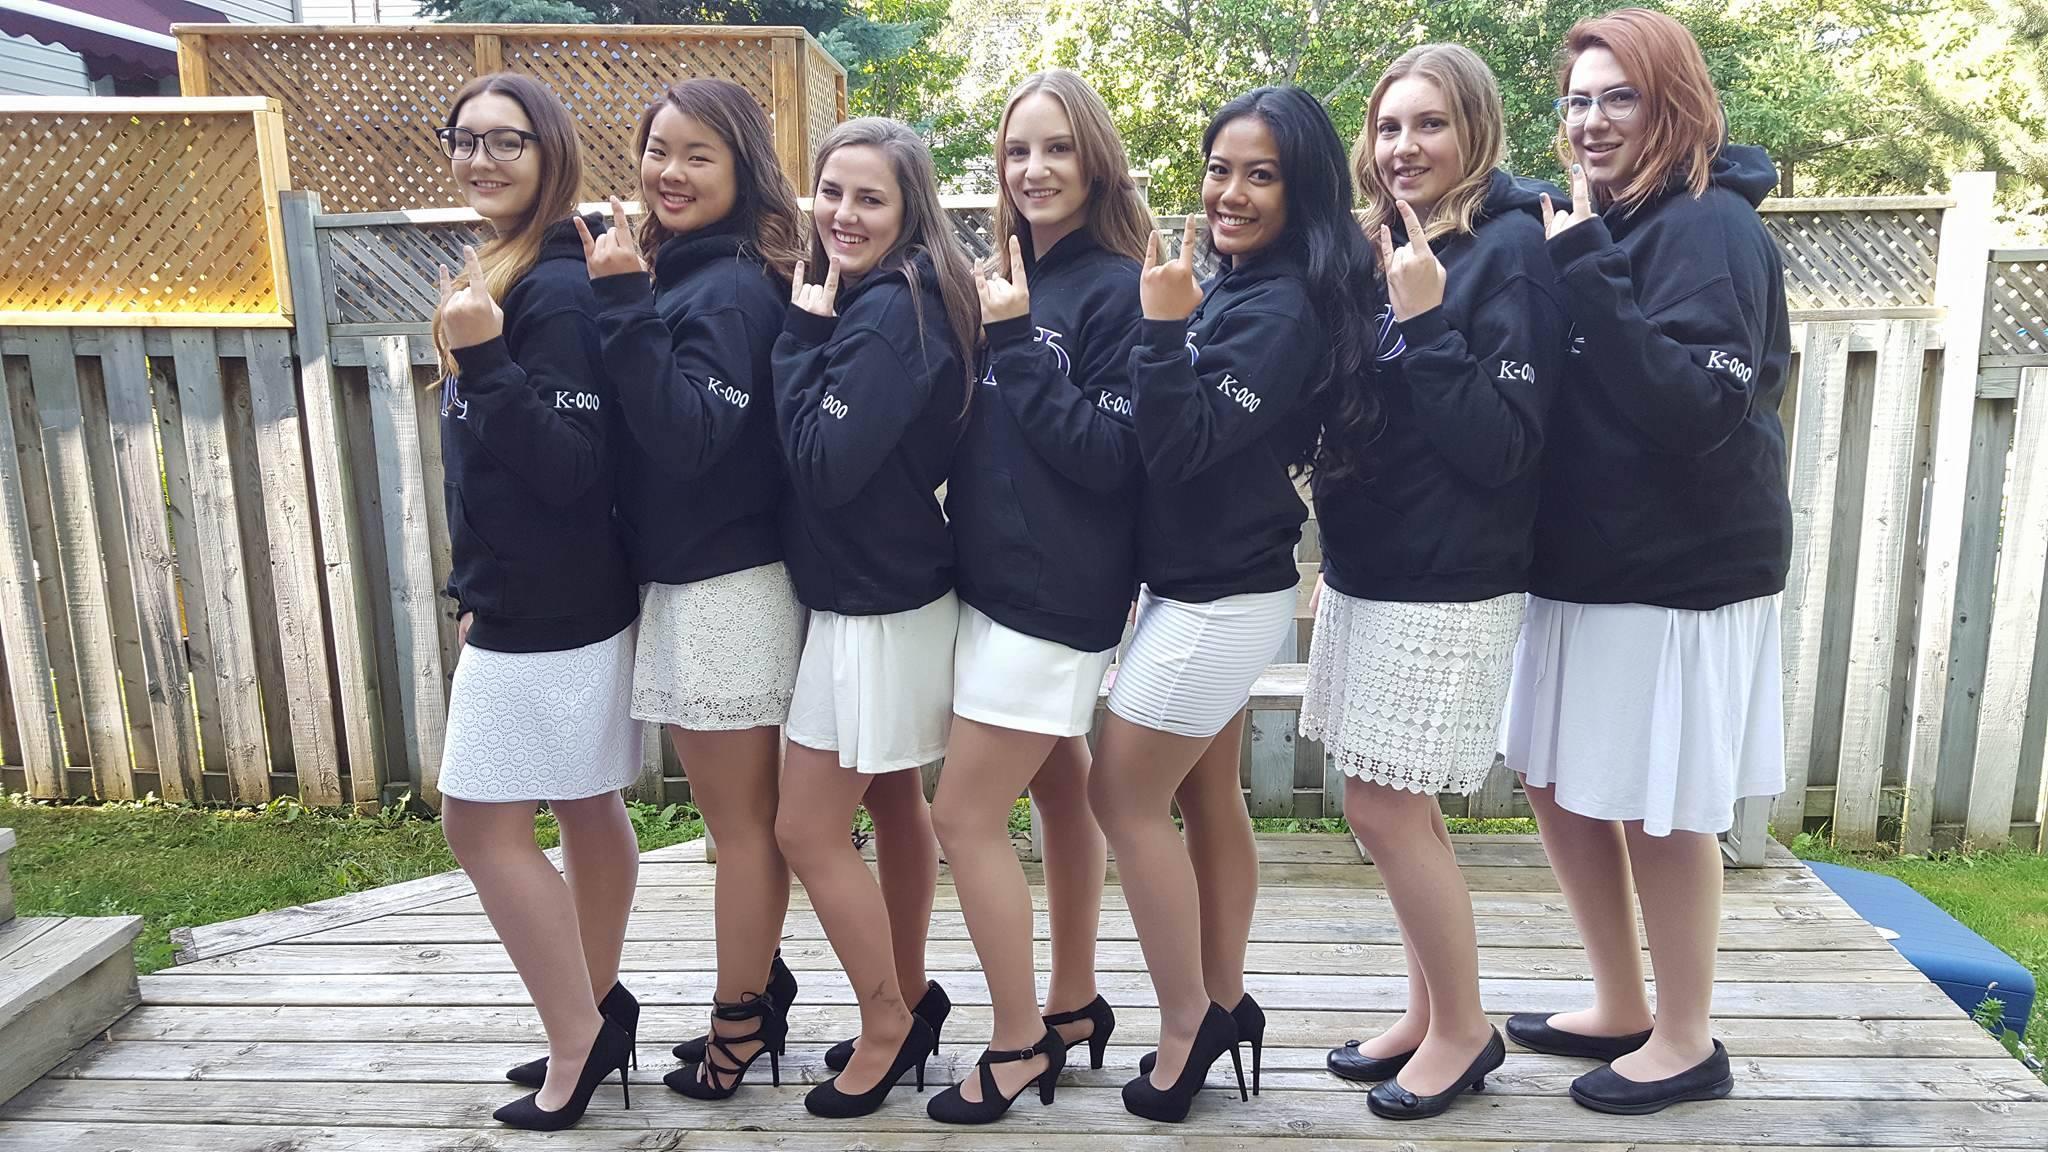 Founding Sisters - Kappa